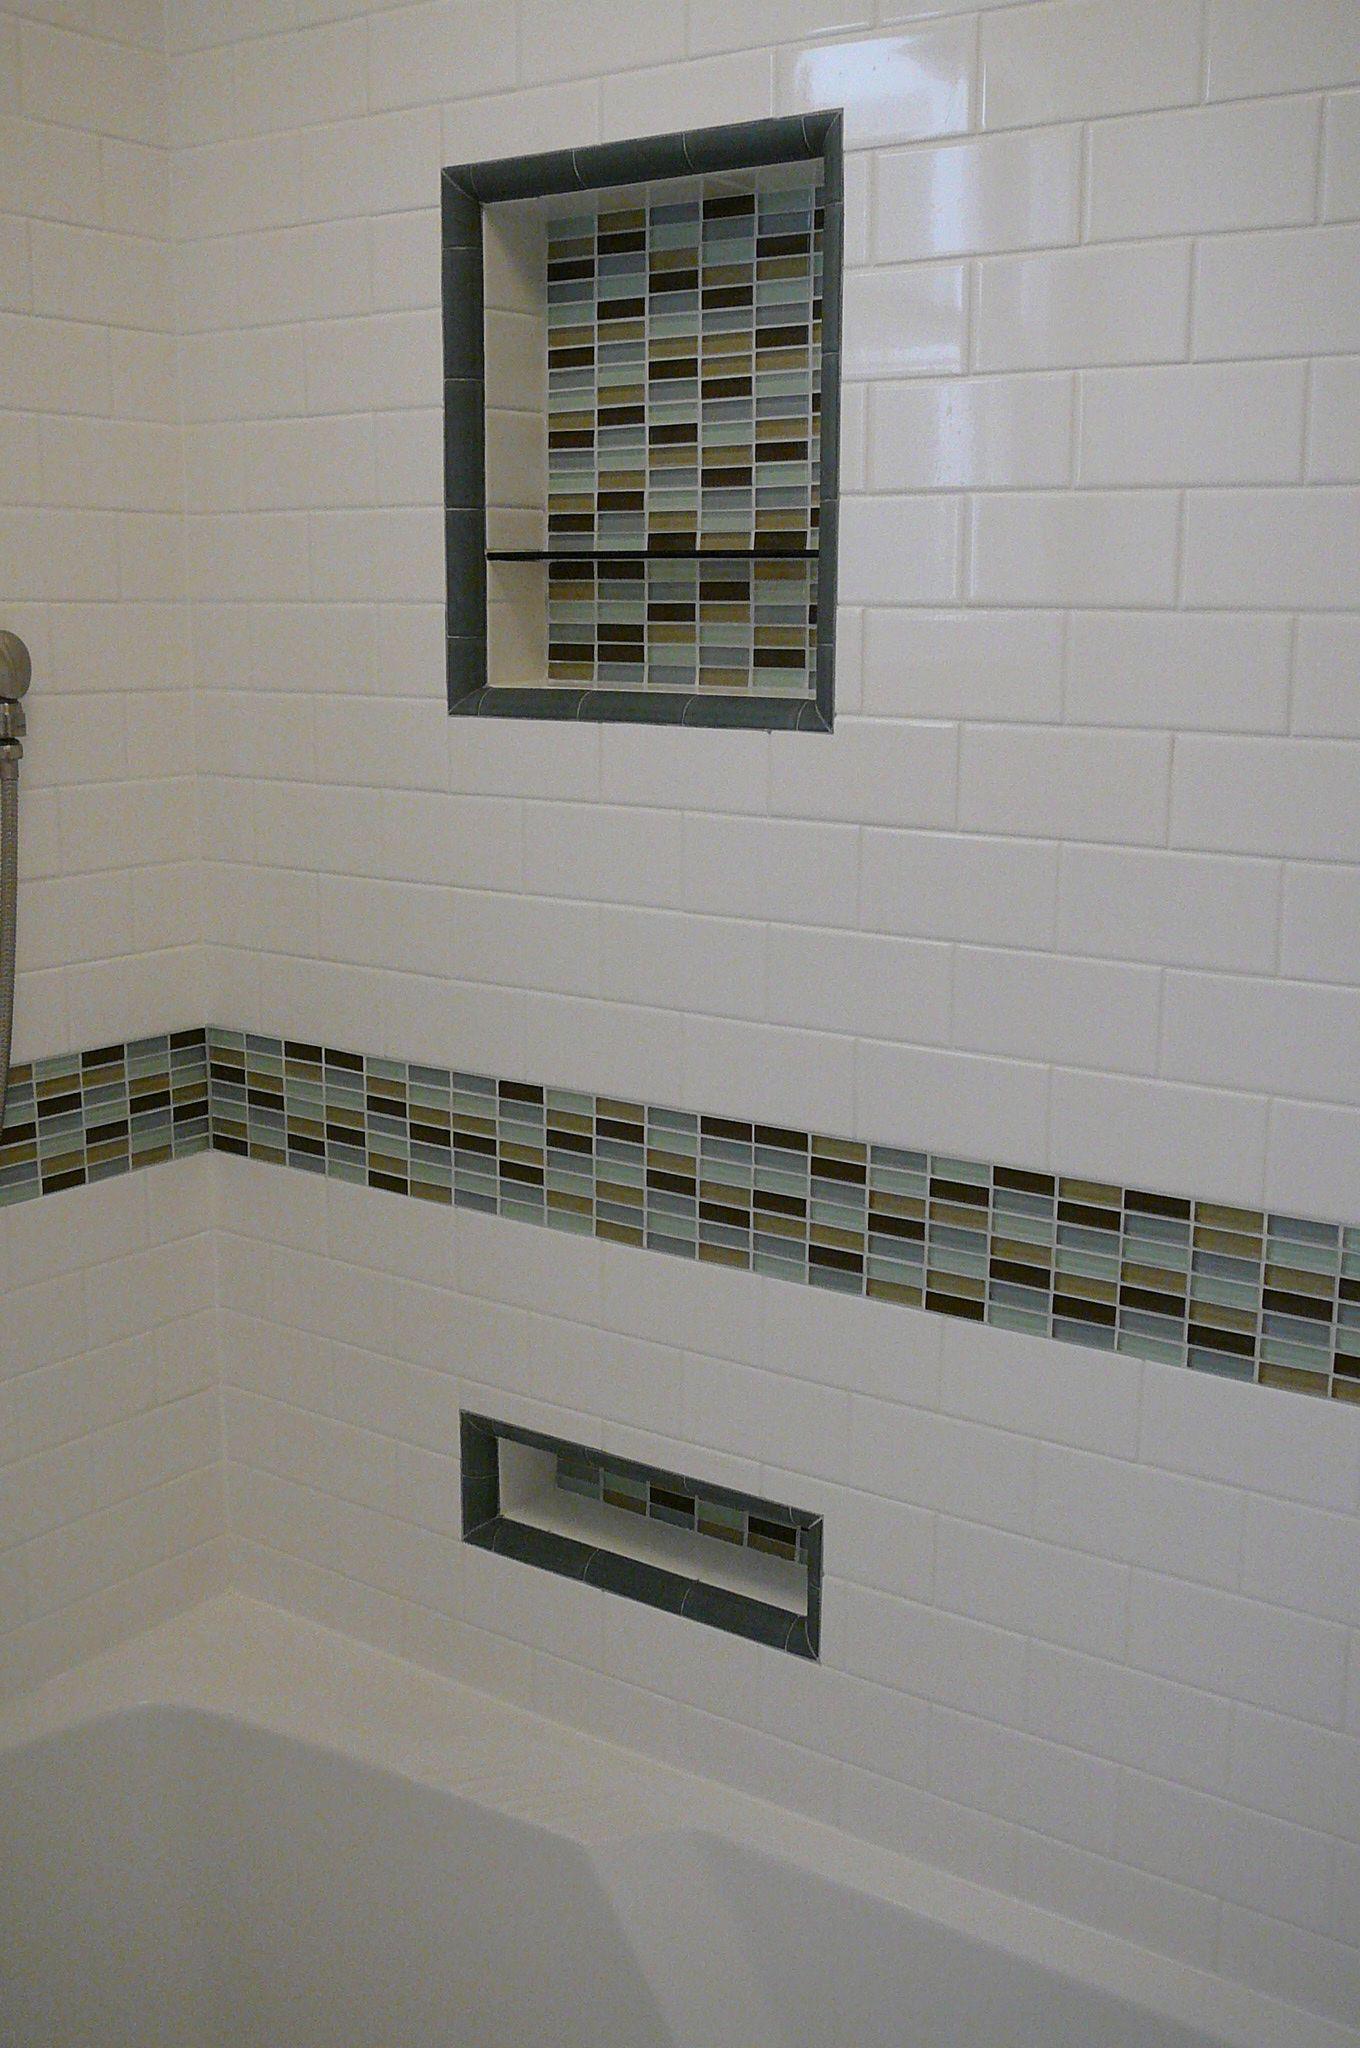 Niches in bathroom walls - Ez Niches Usa Recess Bathroom Shower Shampoo Wall Niche 72 98 Price Not Verified